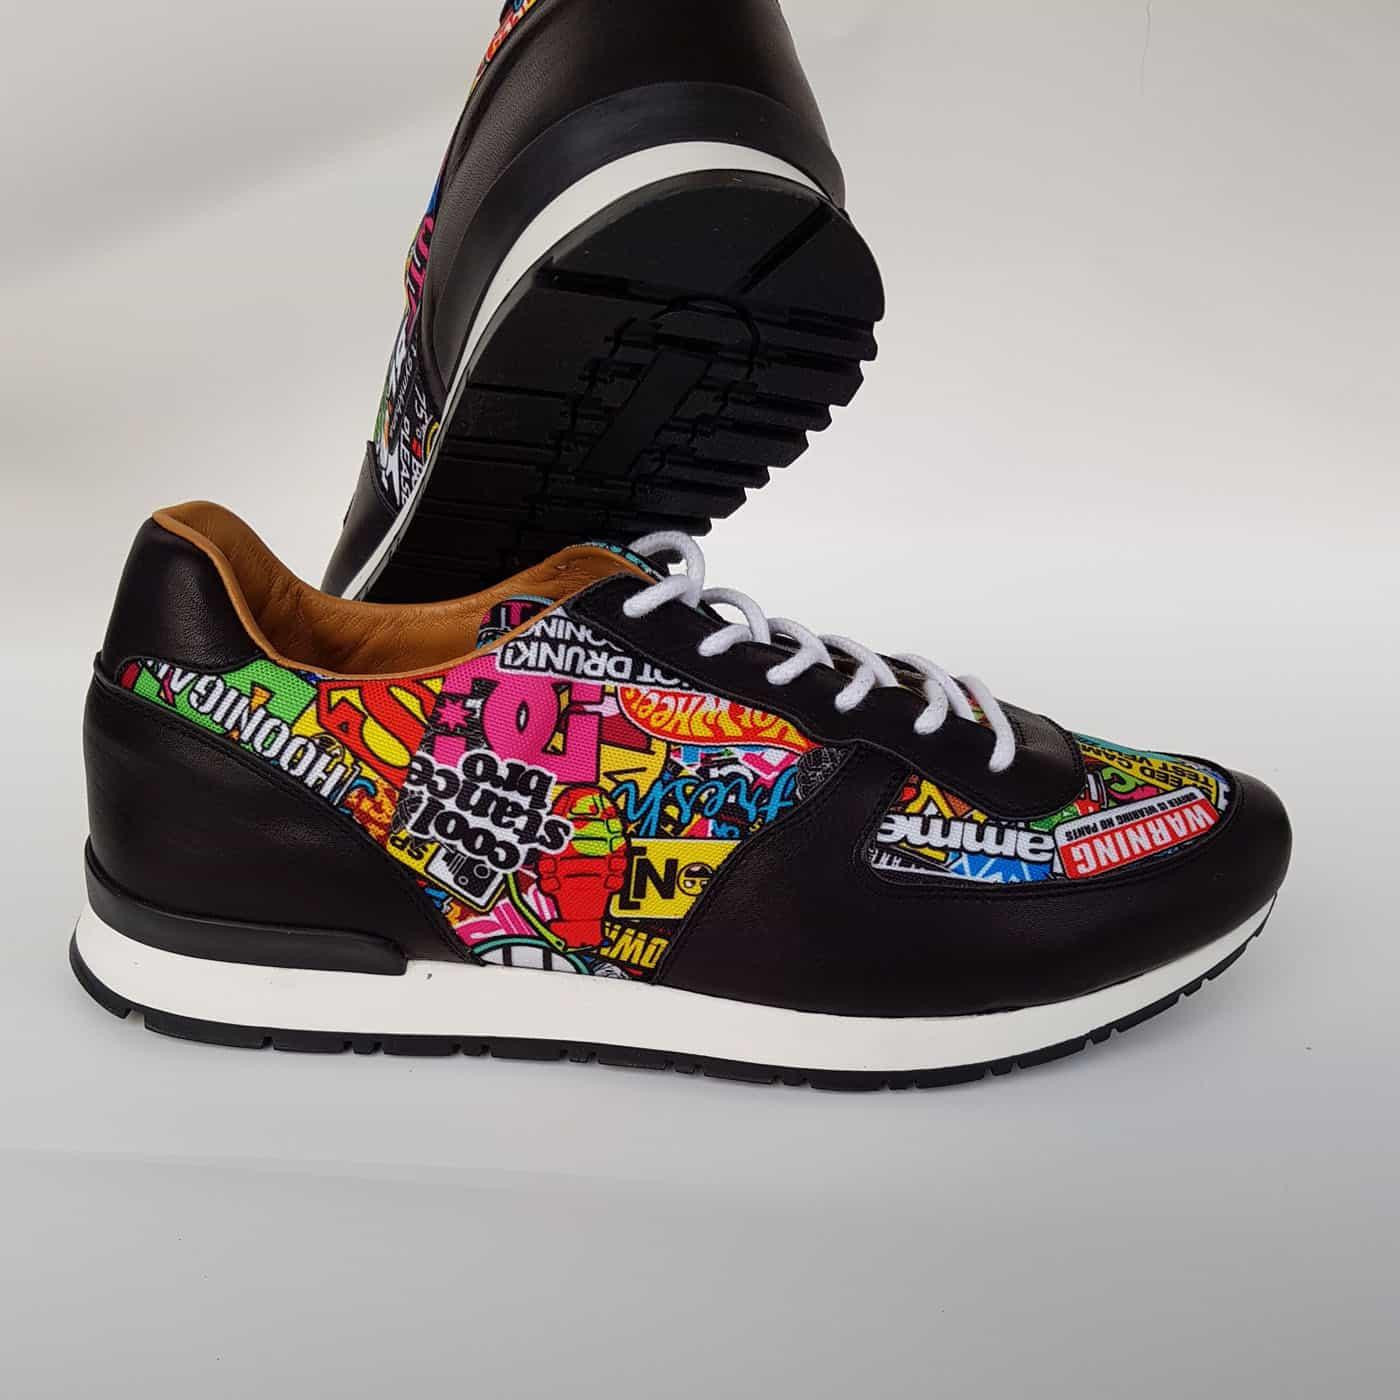 Sneaker / Turnschuh